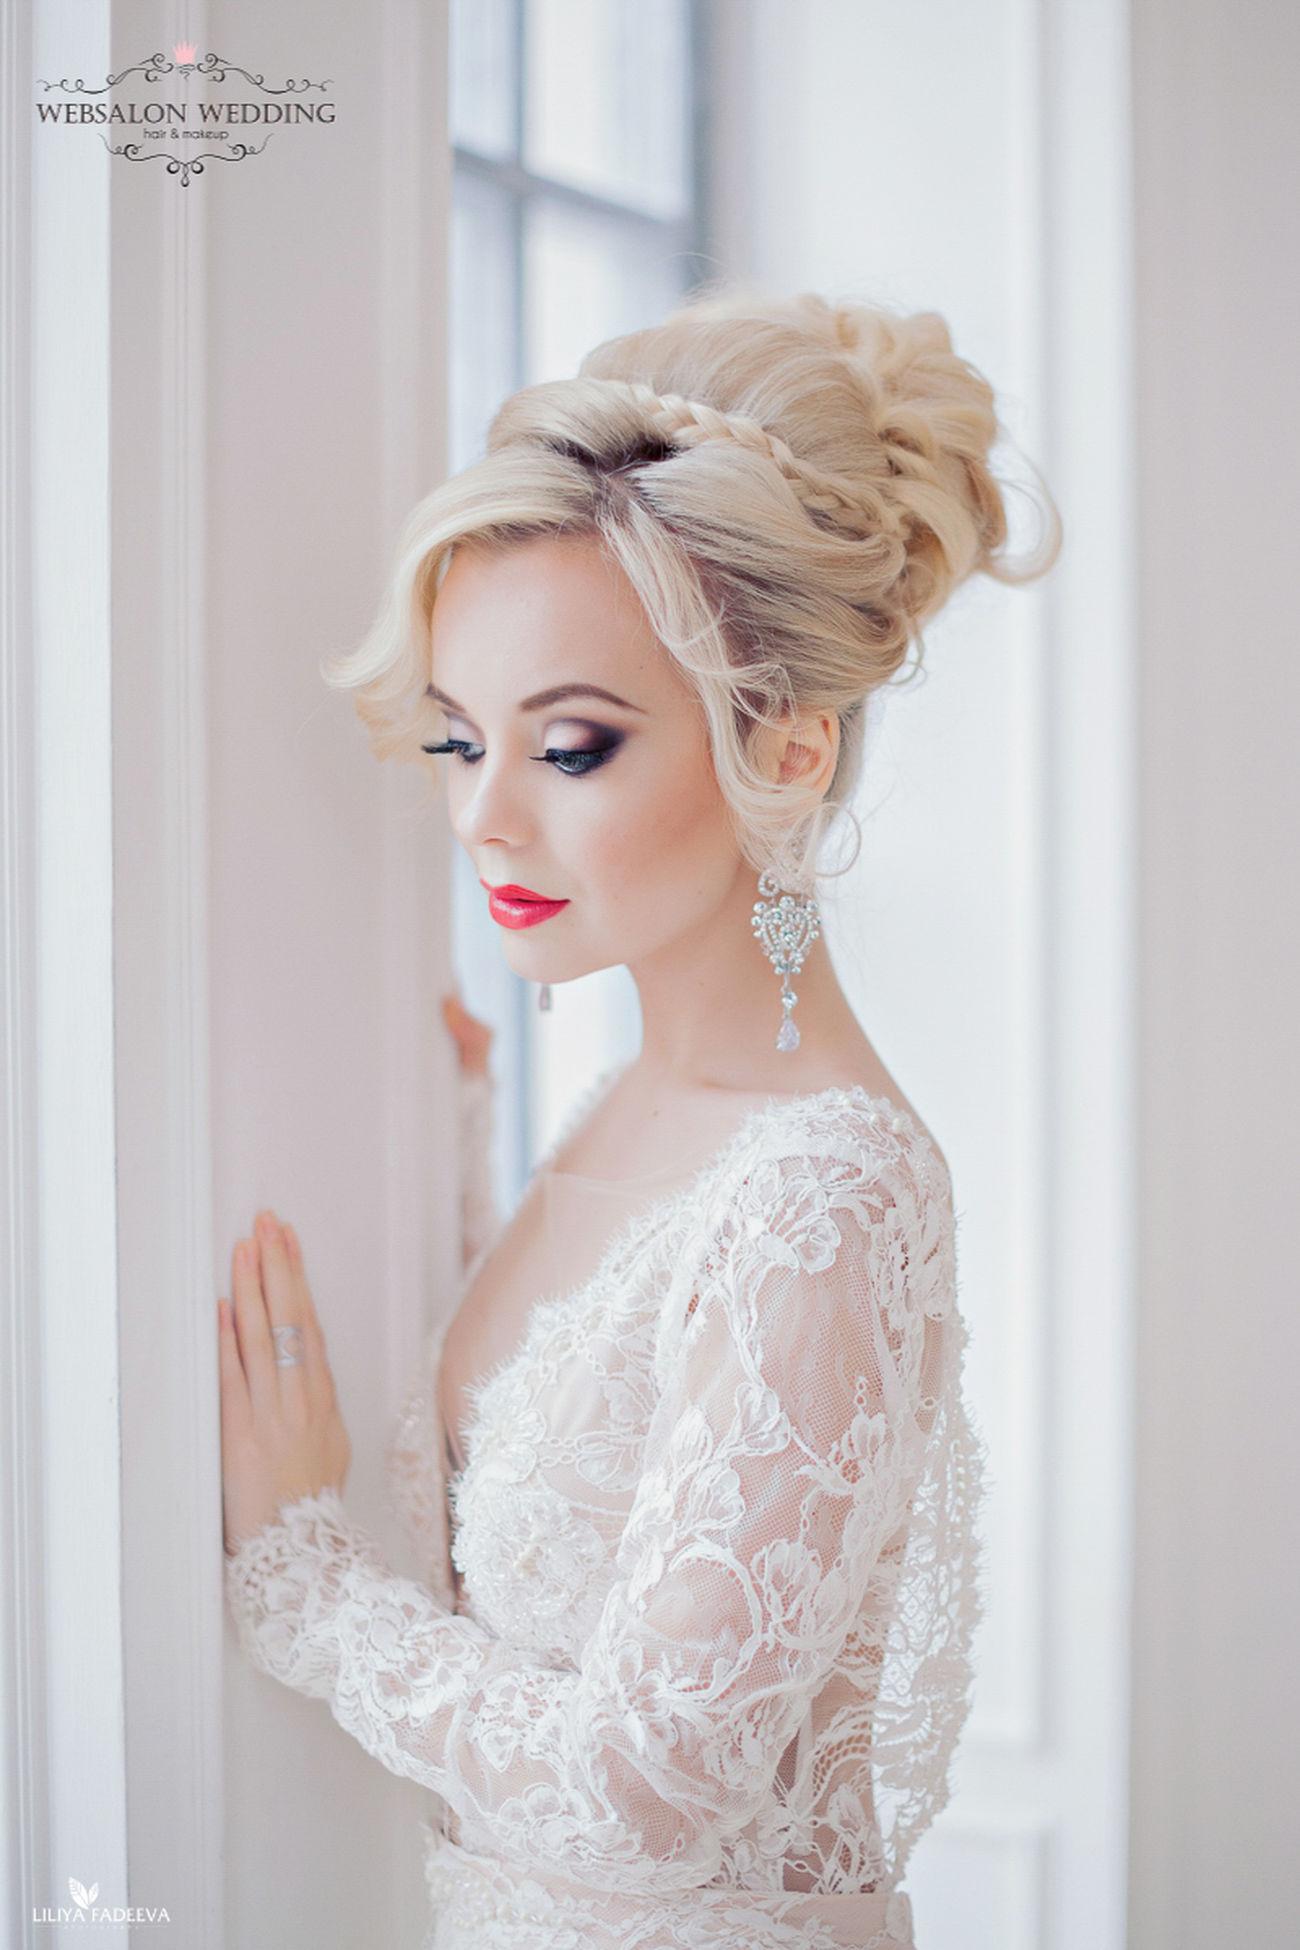 Wedding Dress Novia2015 Wedding2015 Happy Wedding Blonde Girl Wedding Photography Fashion Hair Hairstylist Girl Long Hair